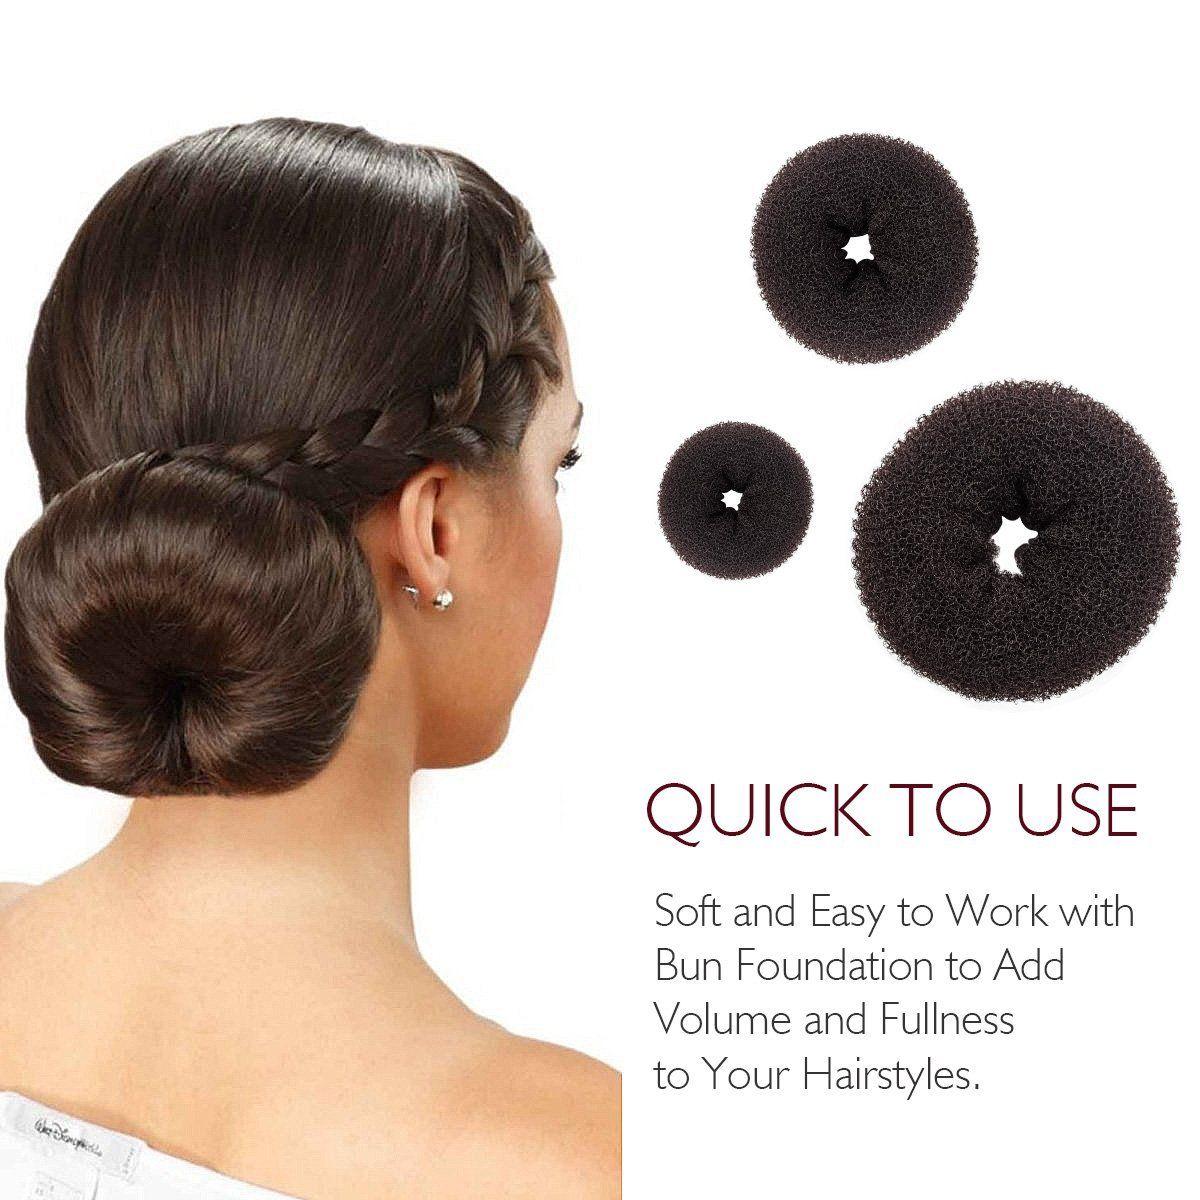 3 Pcs Magic Hair Bun Maker French Twist Donut Former Ring Round Buns Hairstyle Tools Diy Doughnuts Chignon S Donut Bun Hairstyles Bun Hairstyles Hair Bun Maker